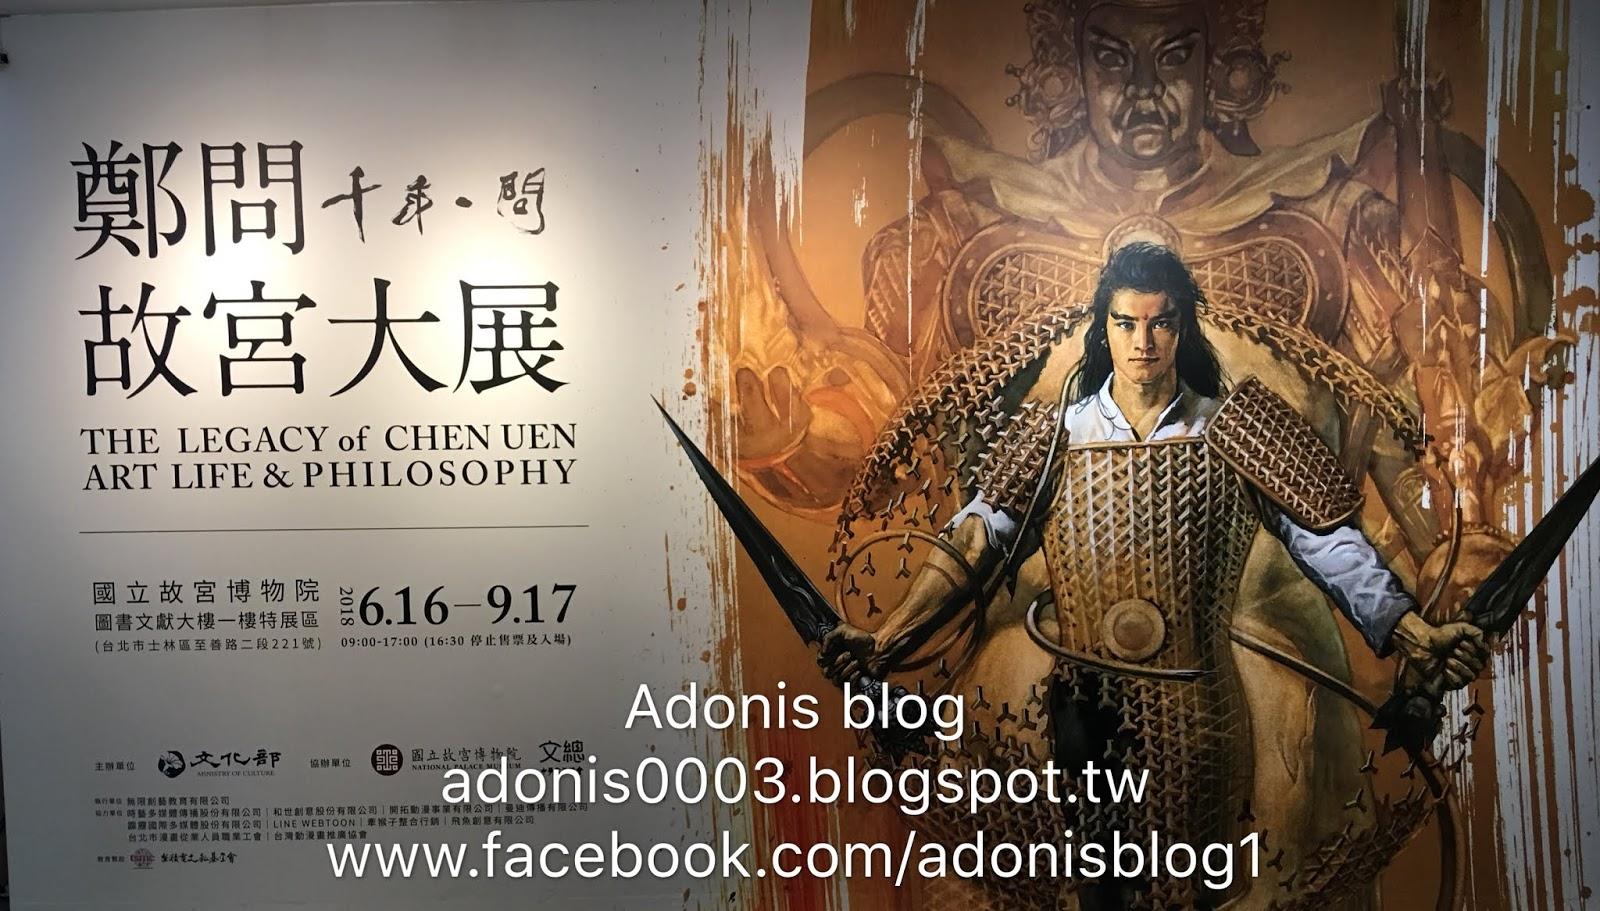 Adonis Blog: 【展覽】千年一問-鄭問故宮大展(THE LEGACY of CHEN UEN ART LIFE & PHILOSOPHY)